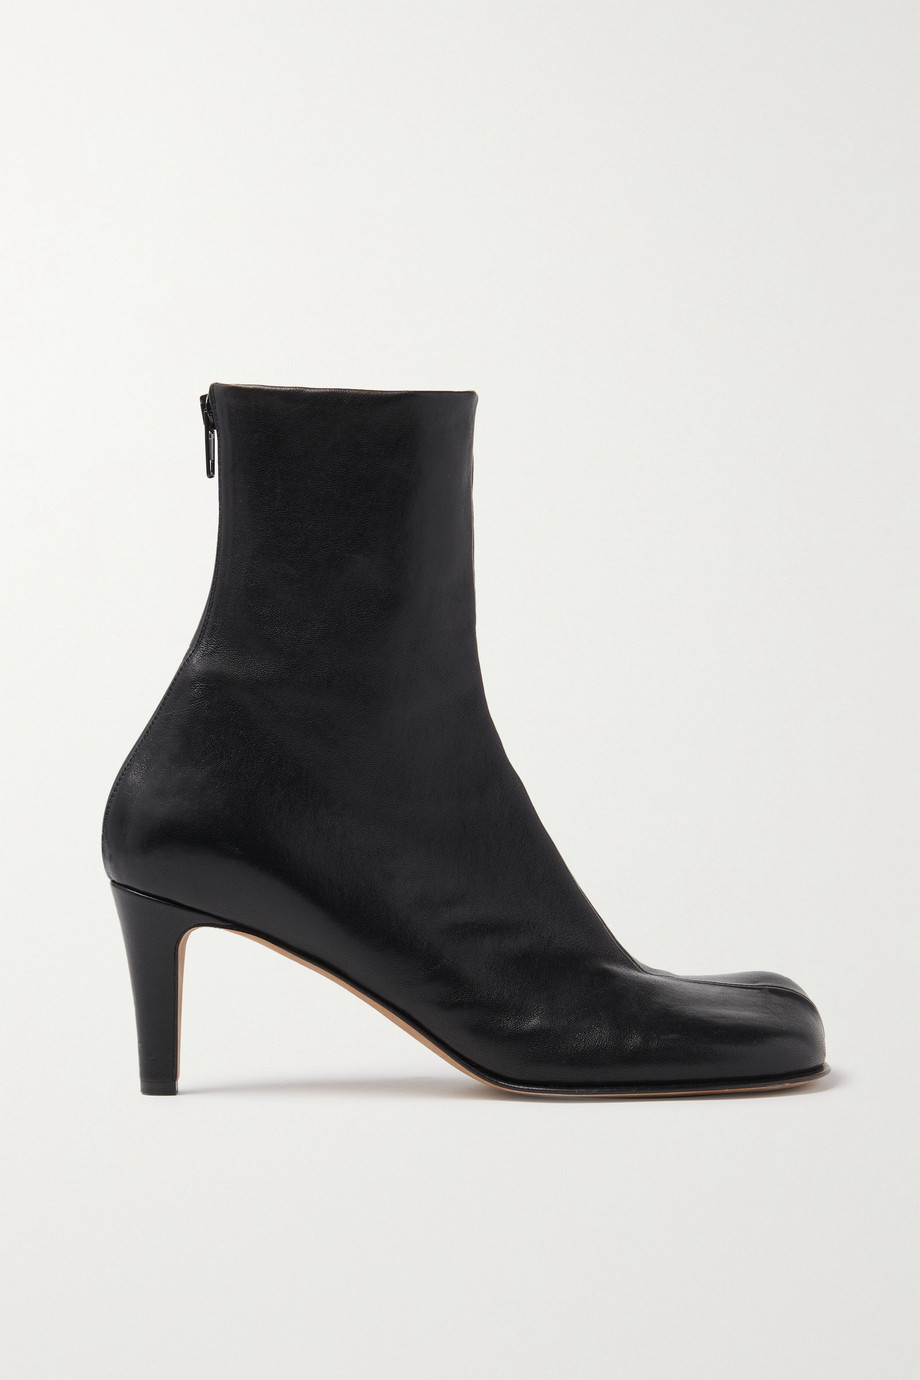 Bottega Veneta Bloc leather ankle boots